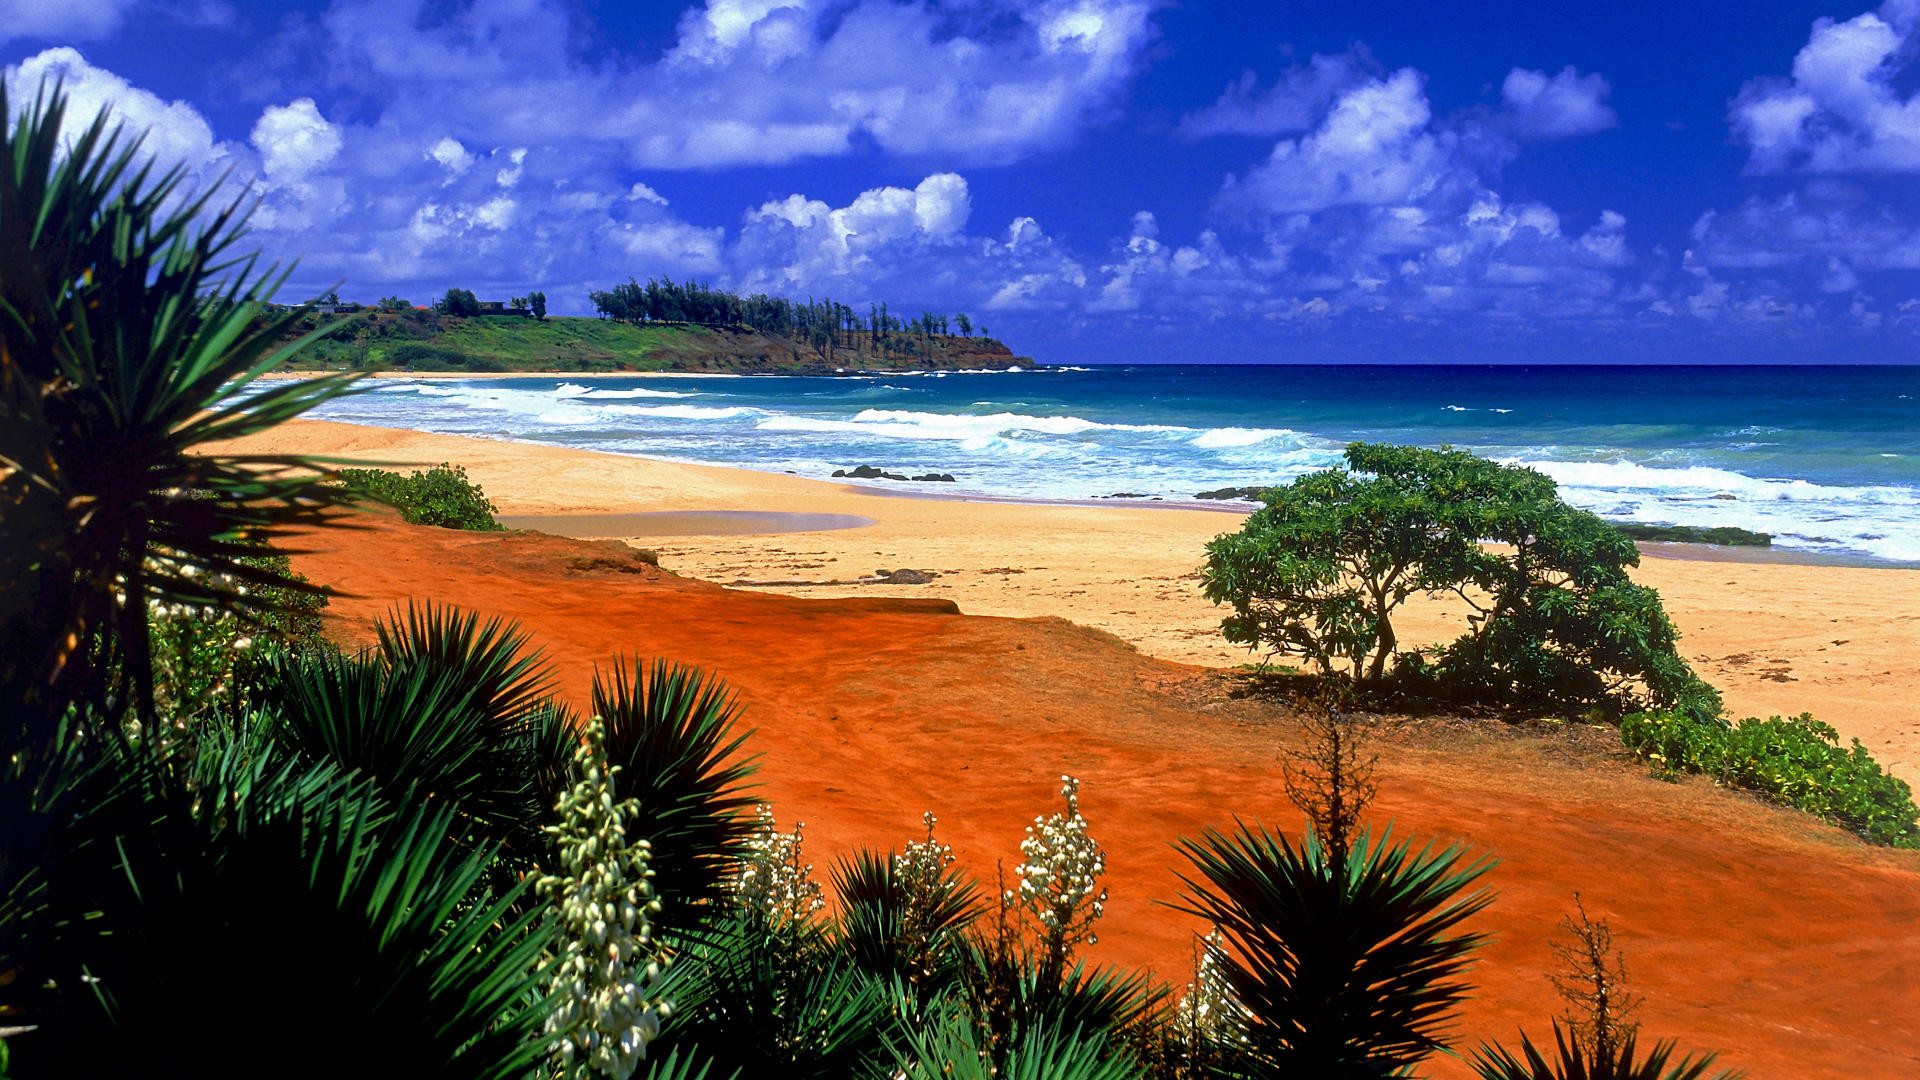 Beach Desktop Backgrounds and Wallpaper – Kealia Beach, Kauai, Hawaii .